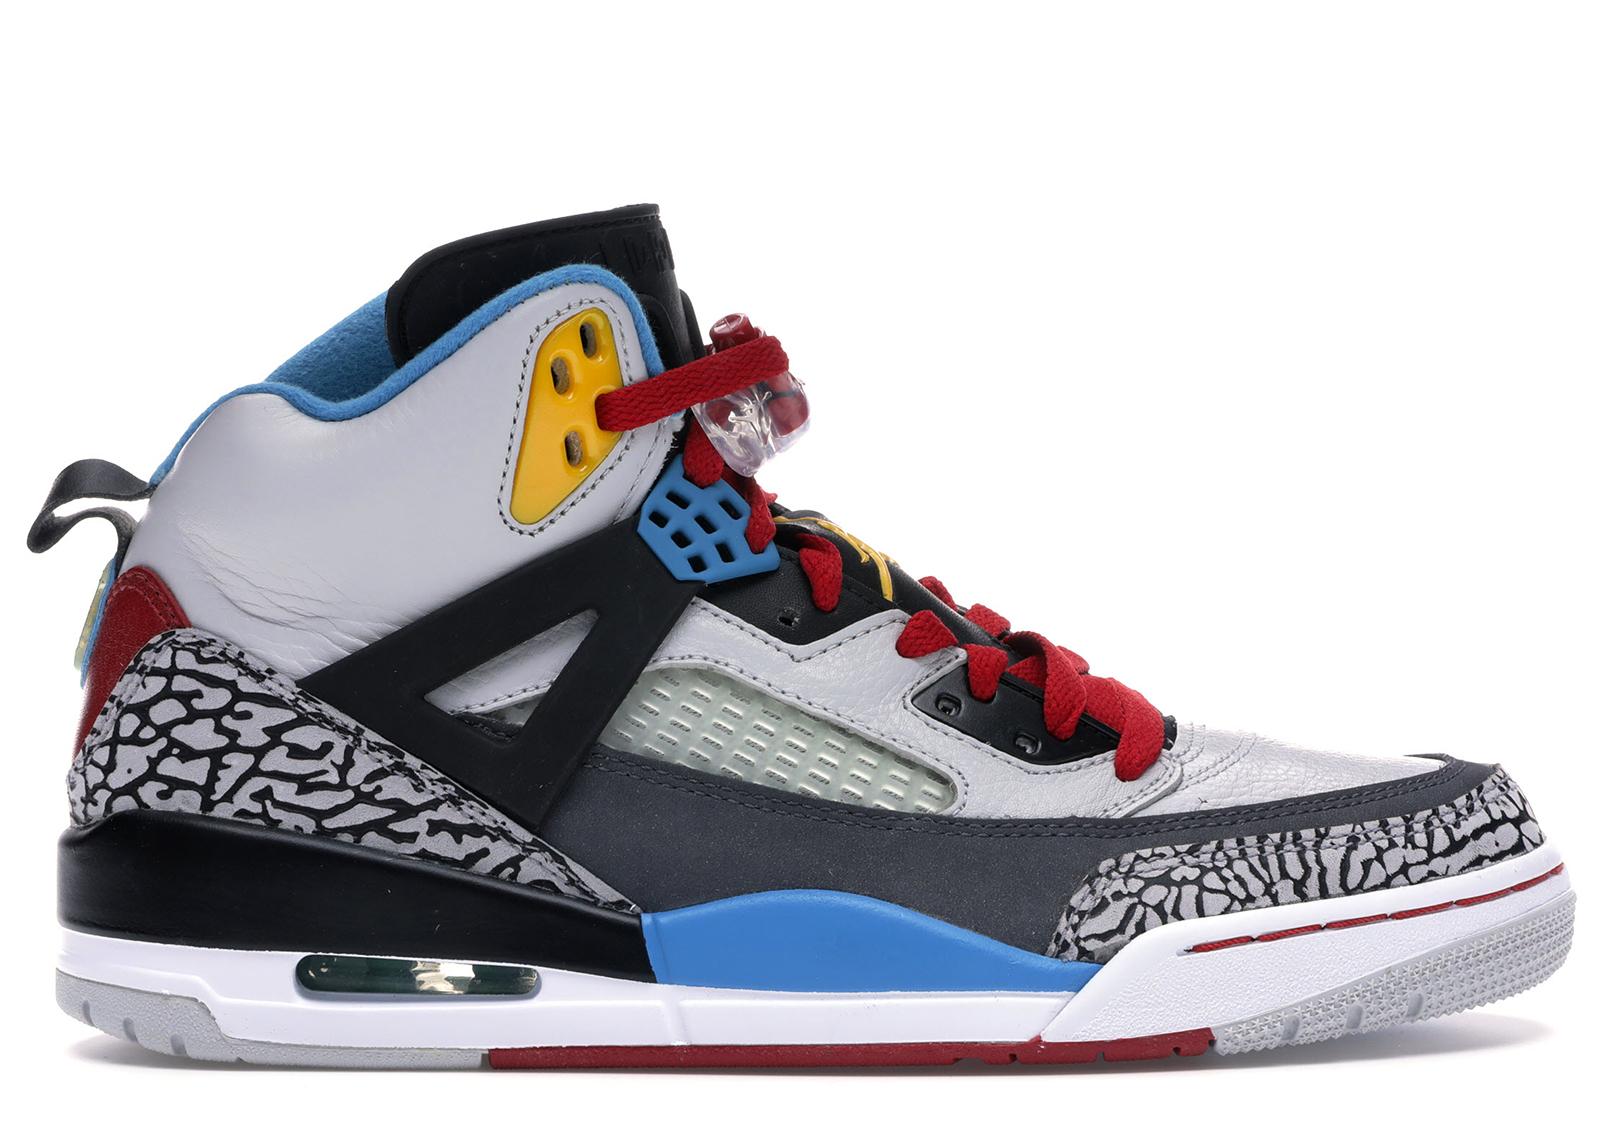 Buy Air Jordan Spizike Shoes & Deadstock Sneakers